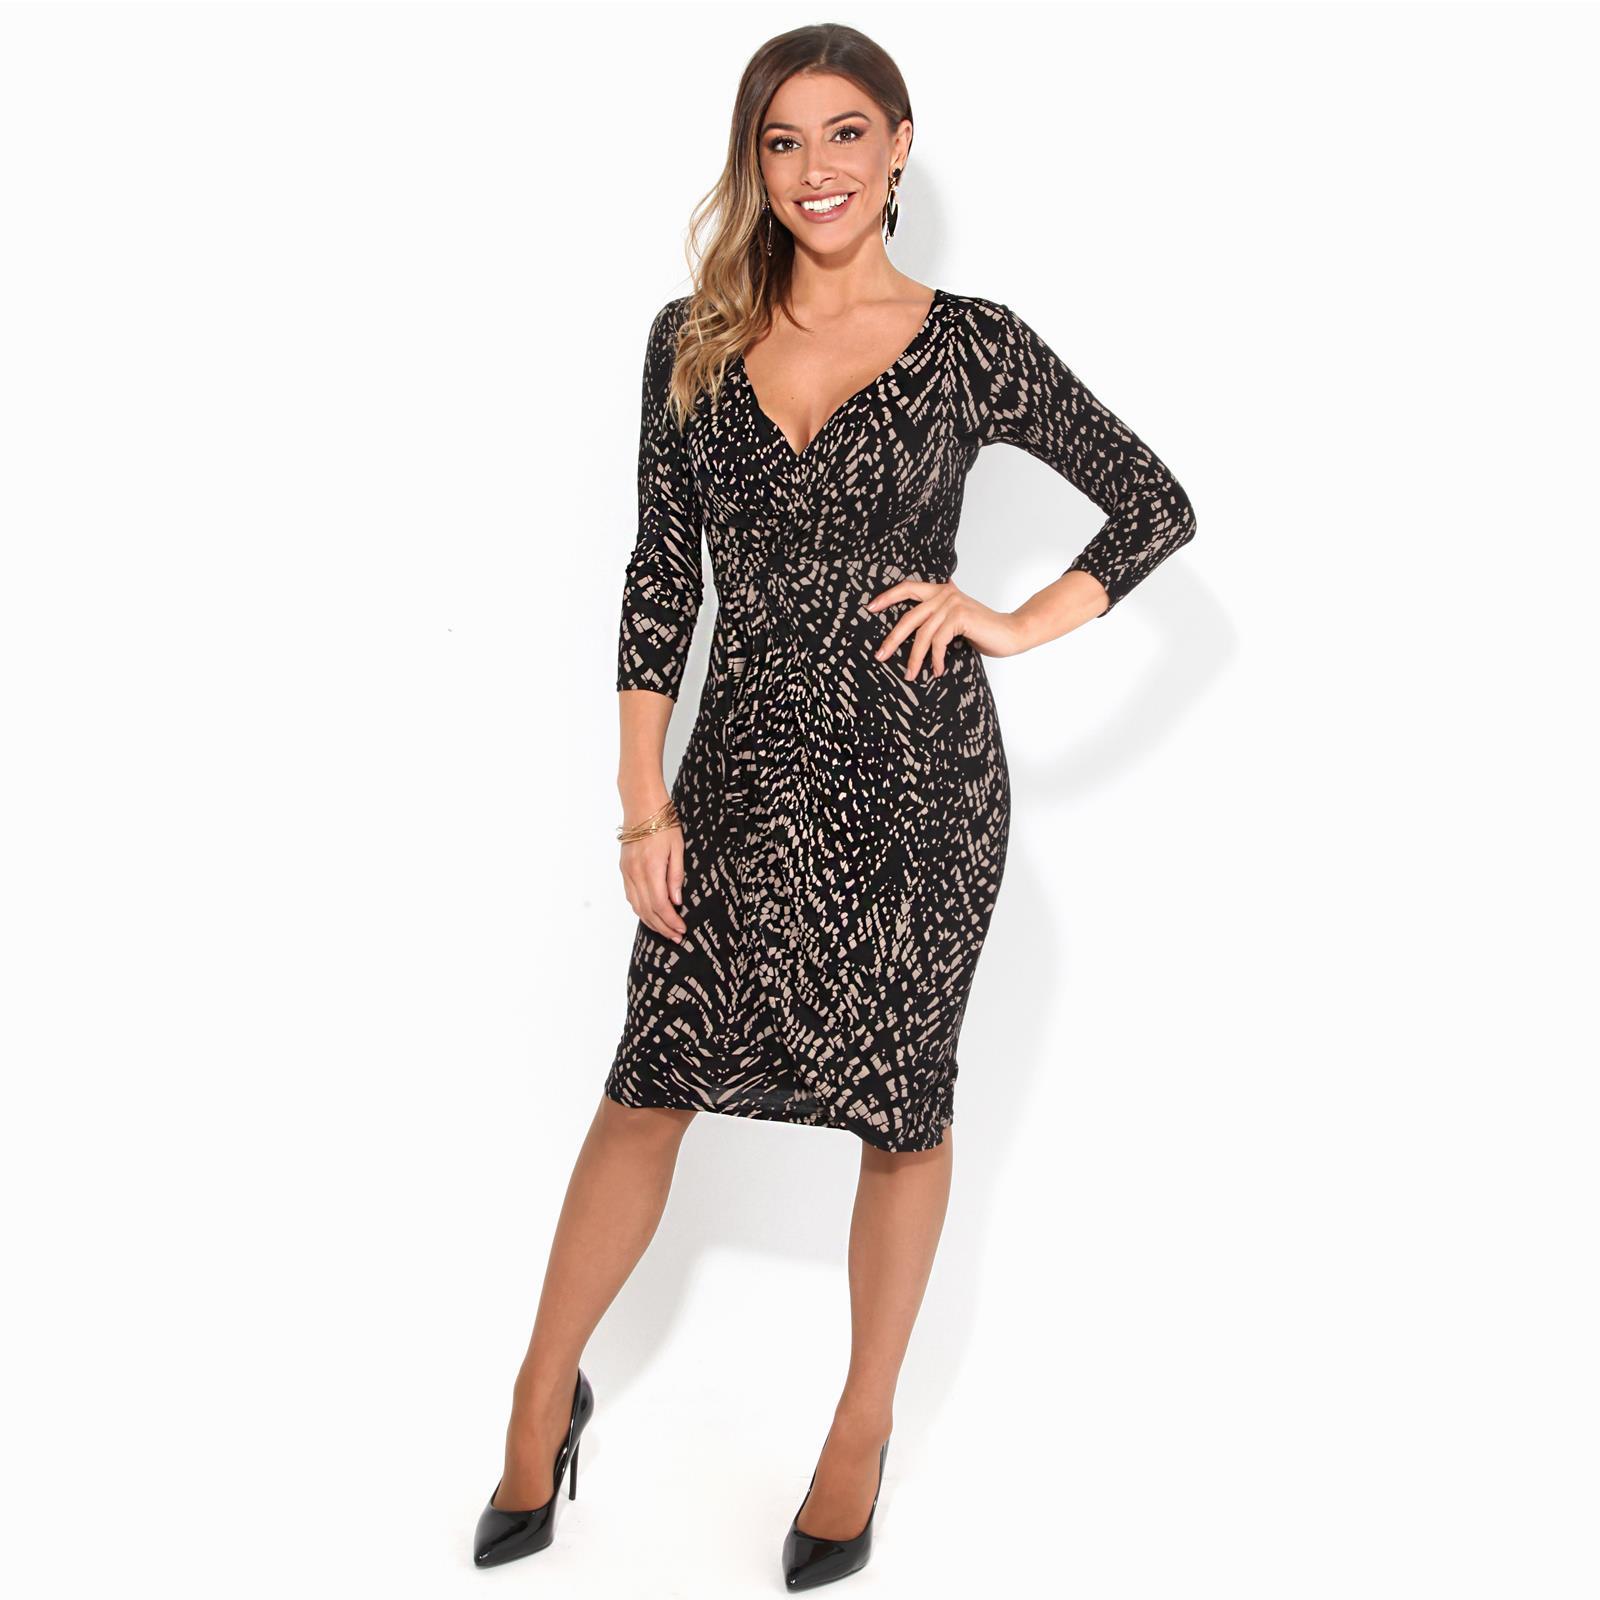 Womens-V-Neck-Dress-Top-Bodycon-Skirt-Midi-Snakeskin-Print-Cross-Over-Party-Wrap thumbnail 12